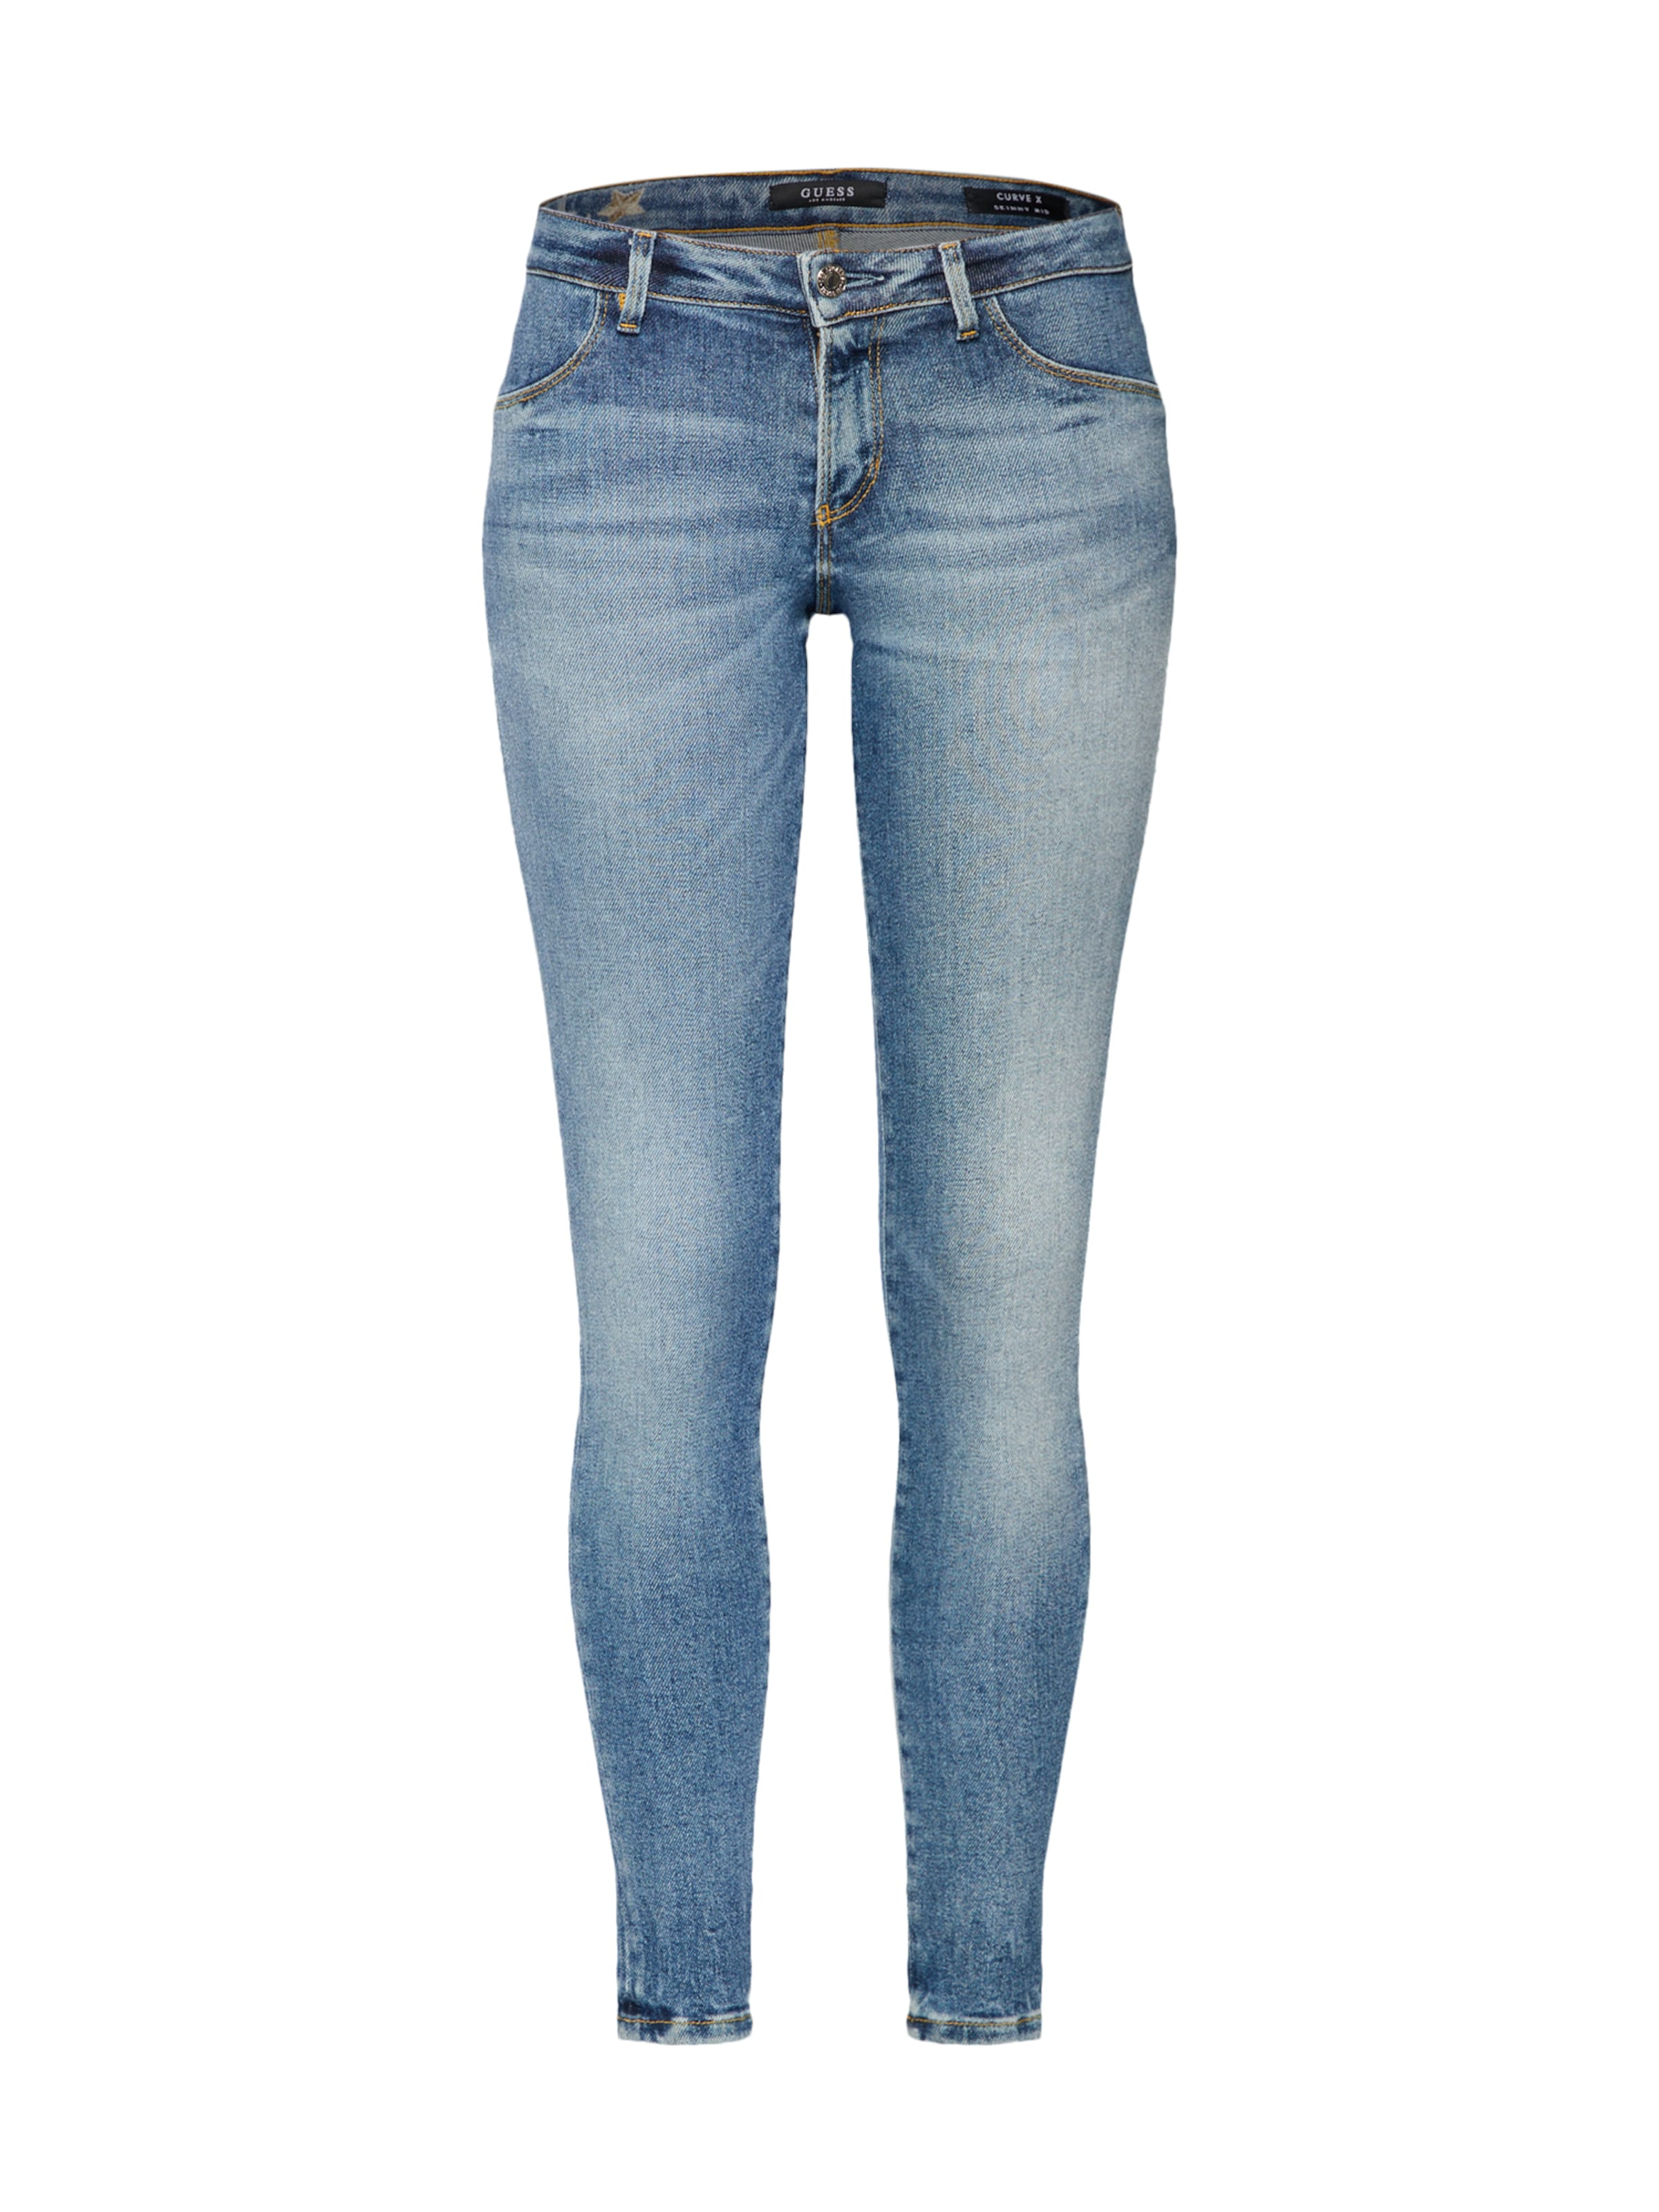 Guess Denim Blue Jeans Jeans Denim Guess Jeans In In Guess Blue 9H2IEWD